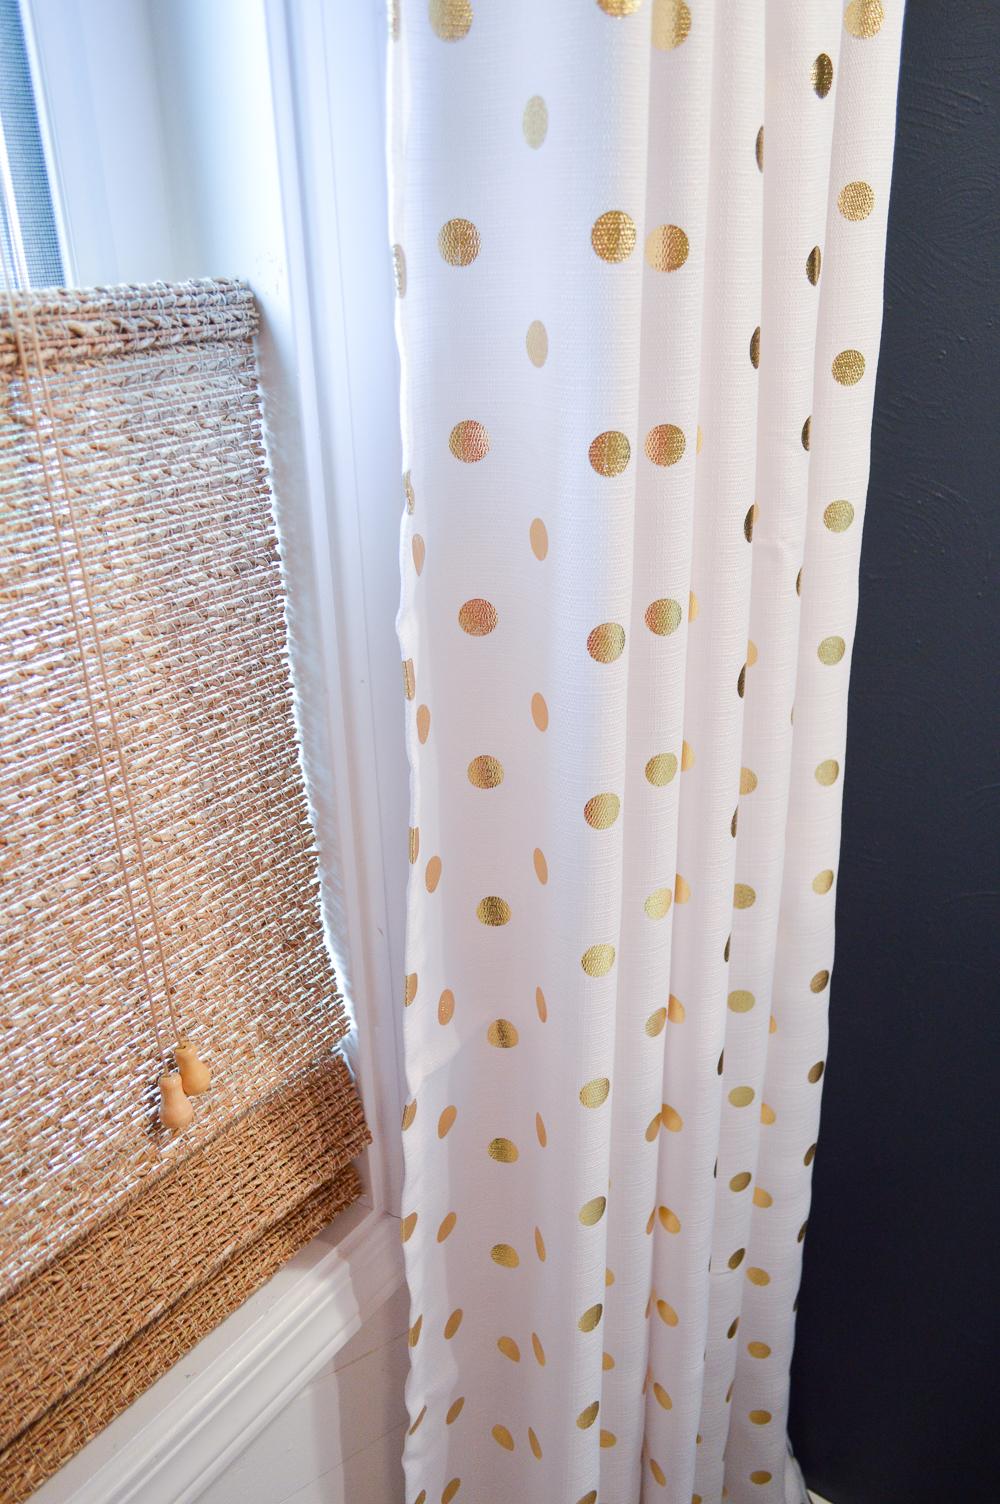 Aqua Summer Bathroom Refresh - Navy walls, textured woven blinds, gold/white metallic polka dot curtain drapery panel. #sponsored